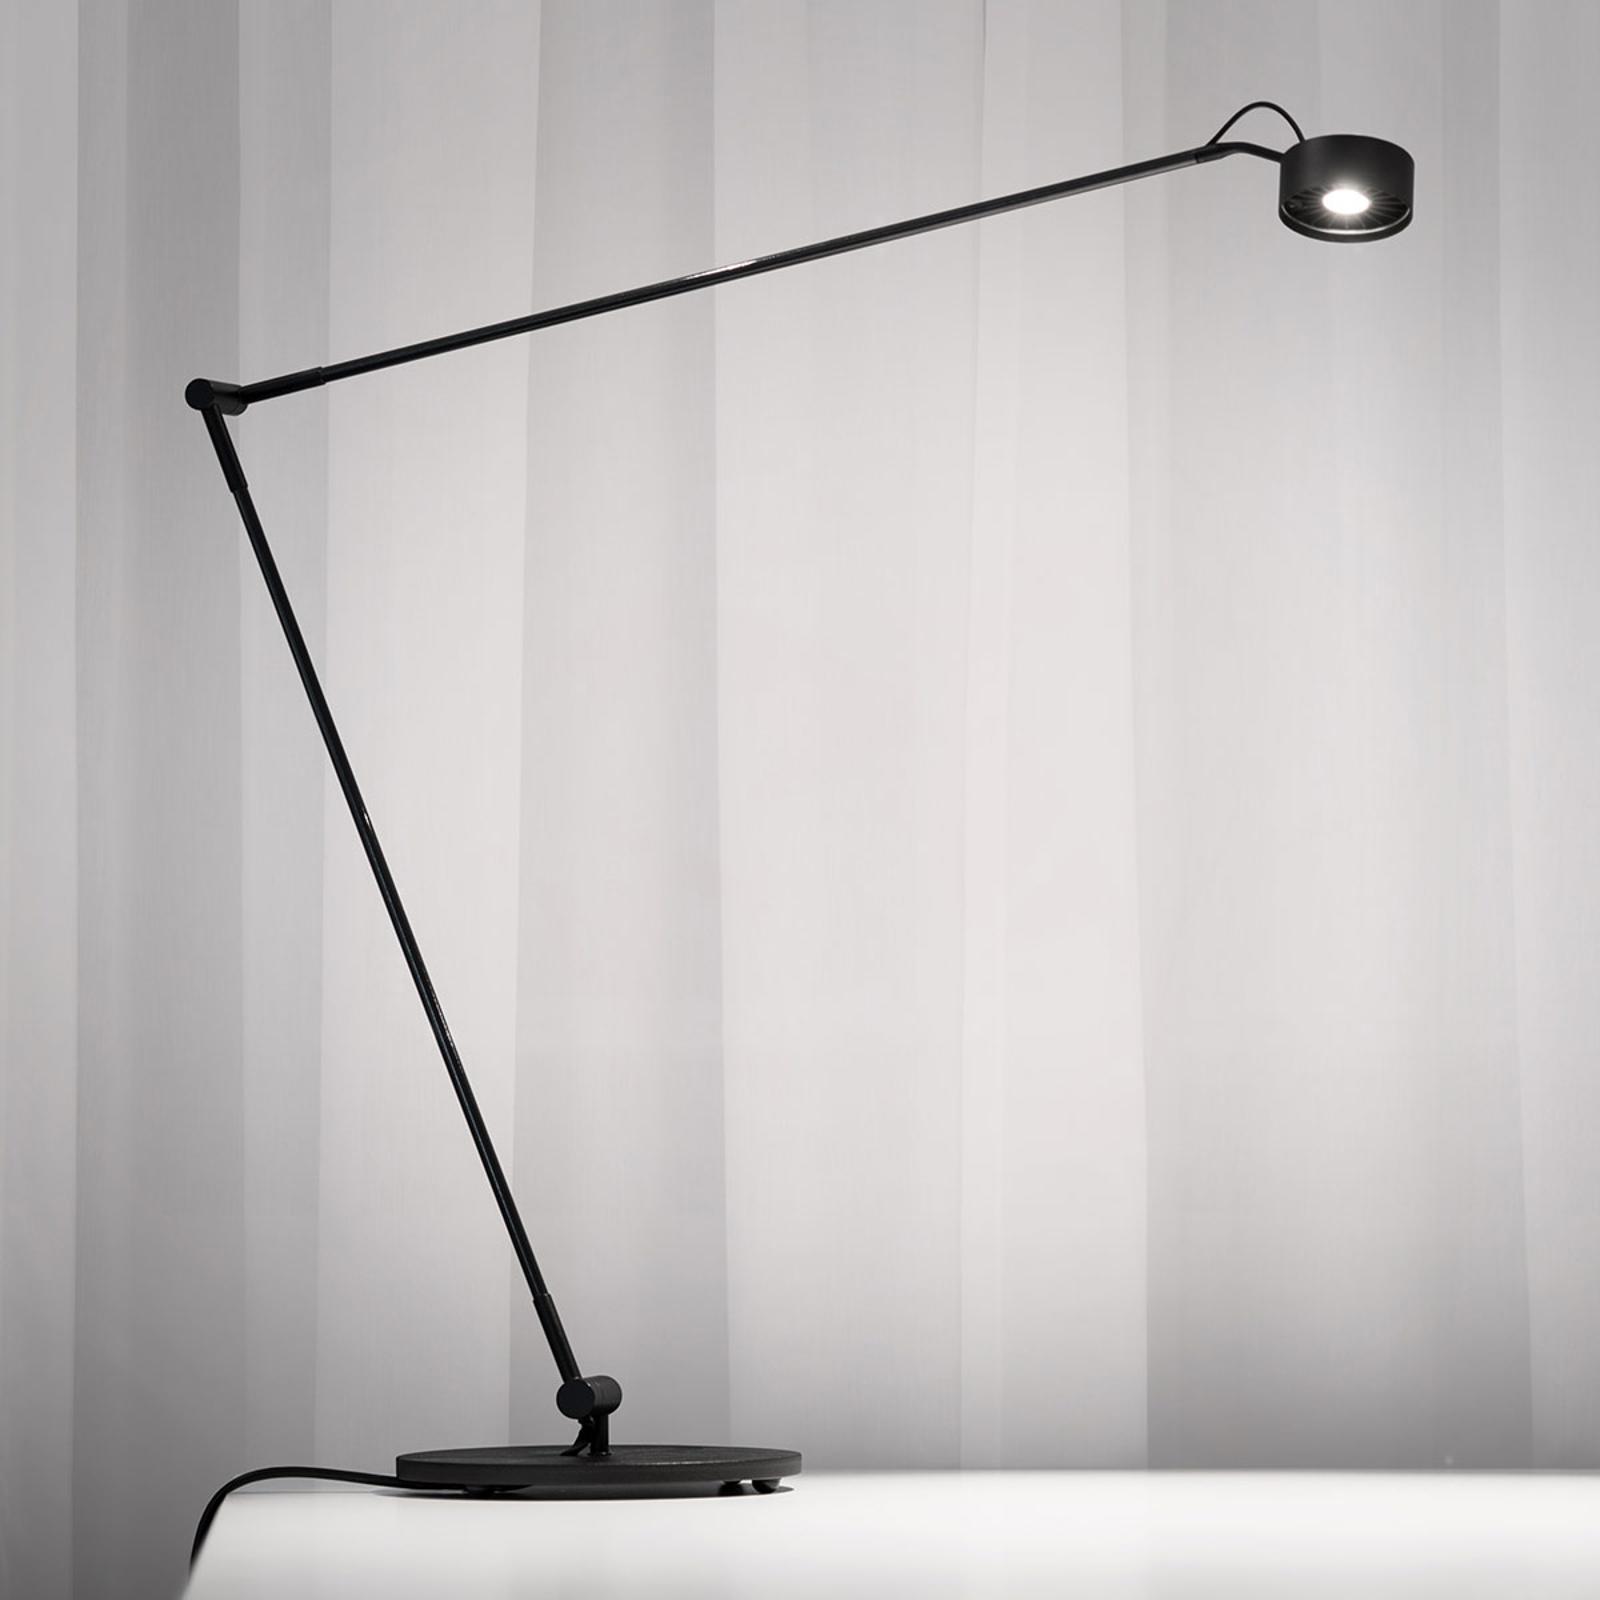 Lampe à poser LED Basica 930 E avec flèche, noir